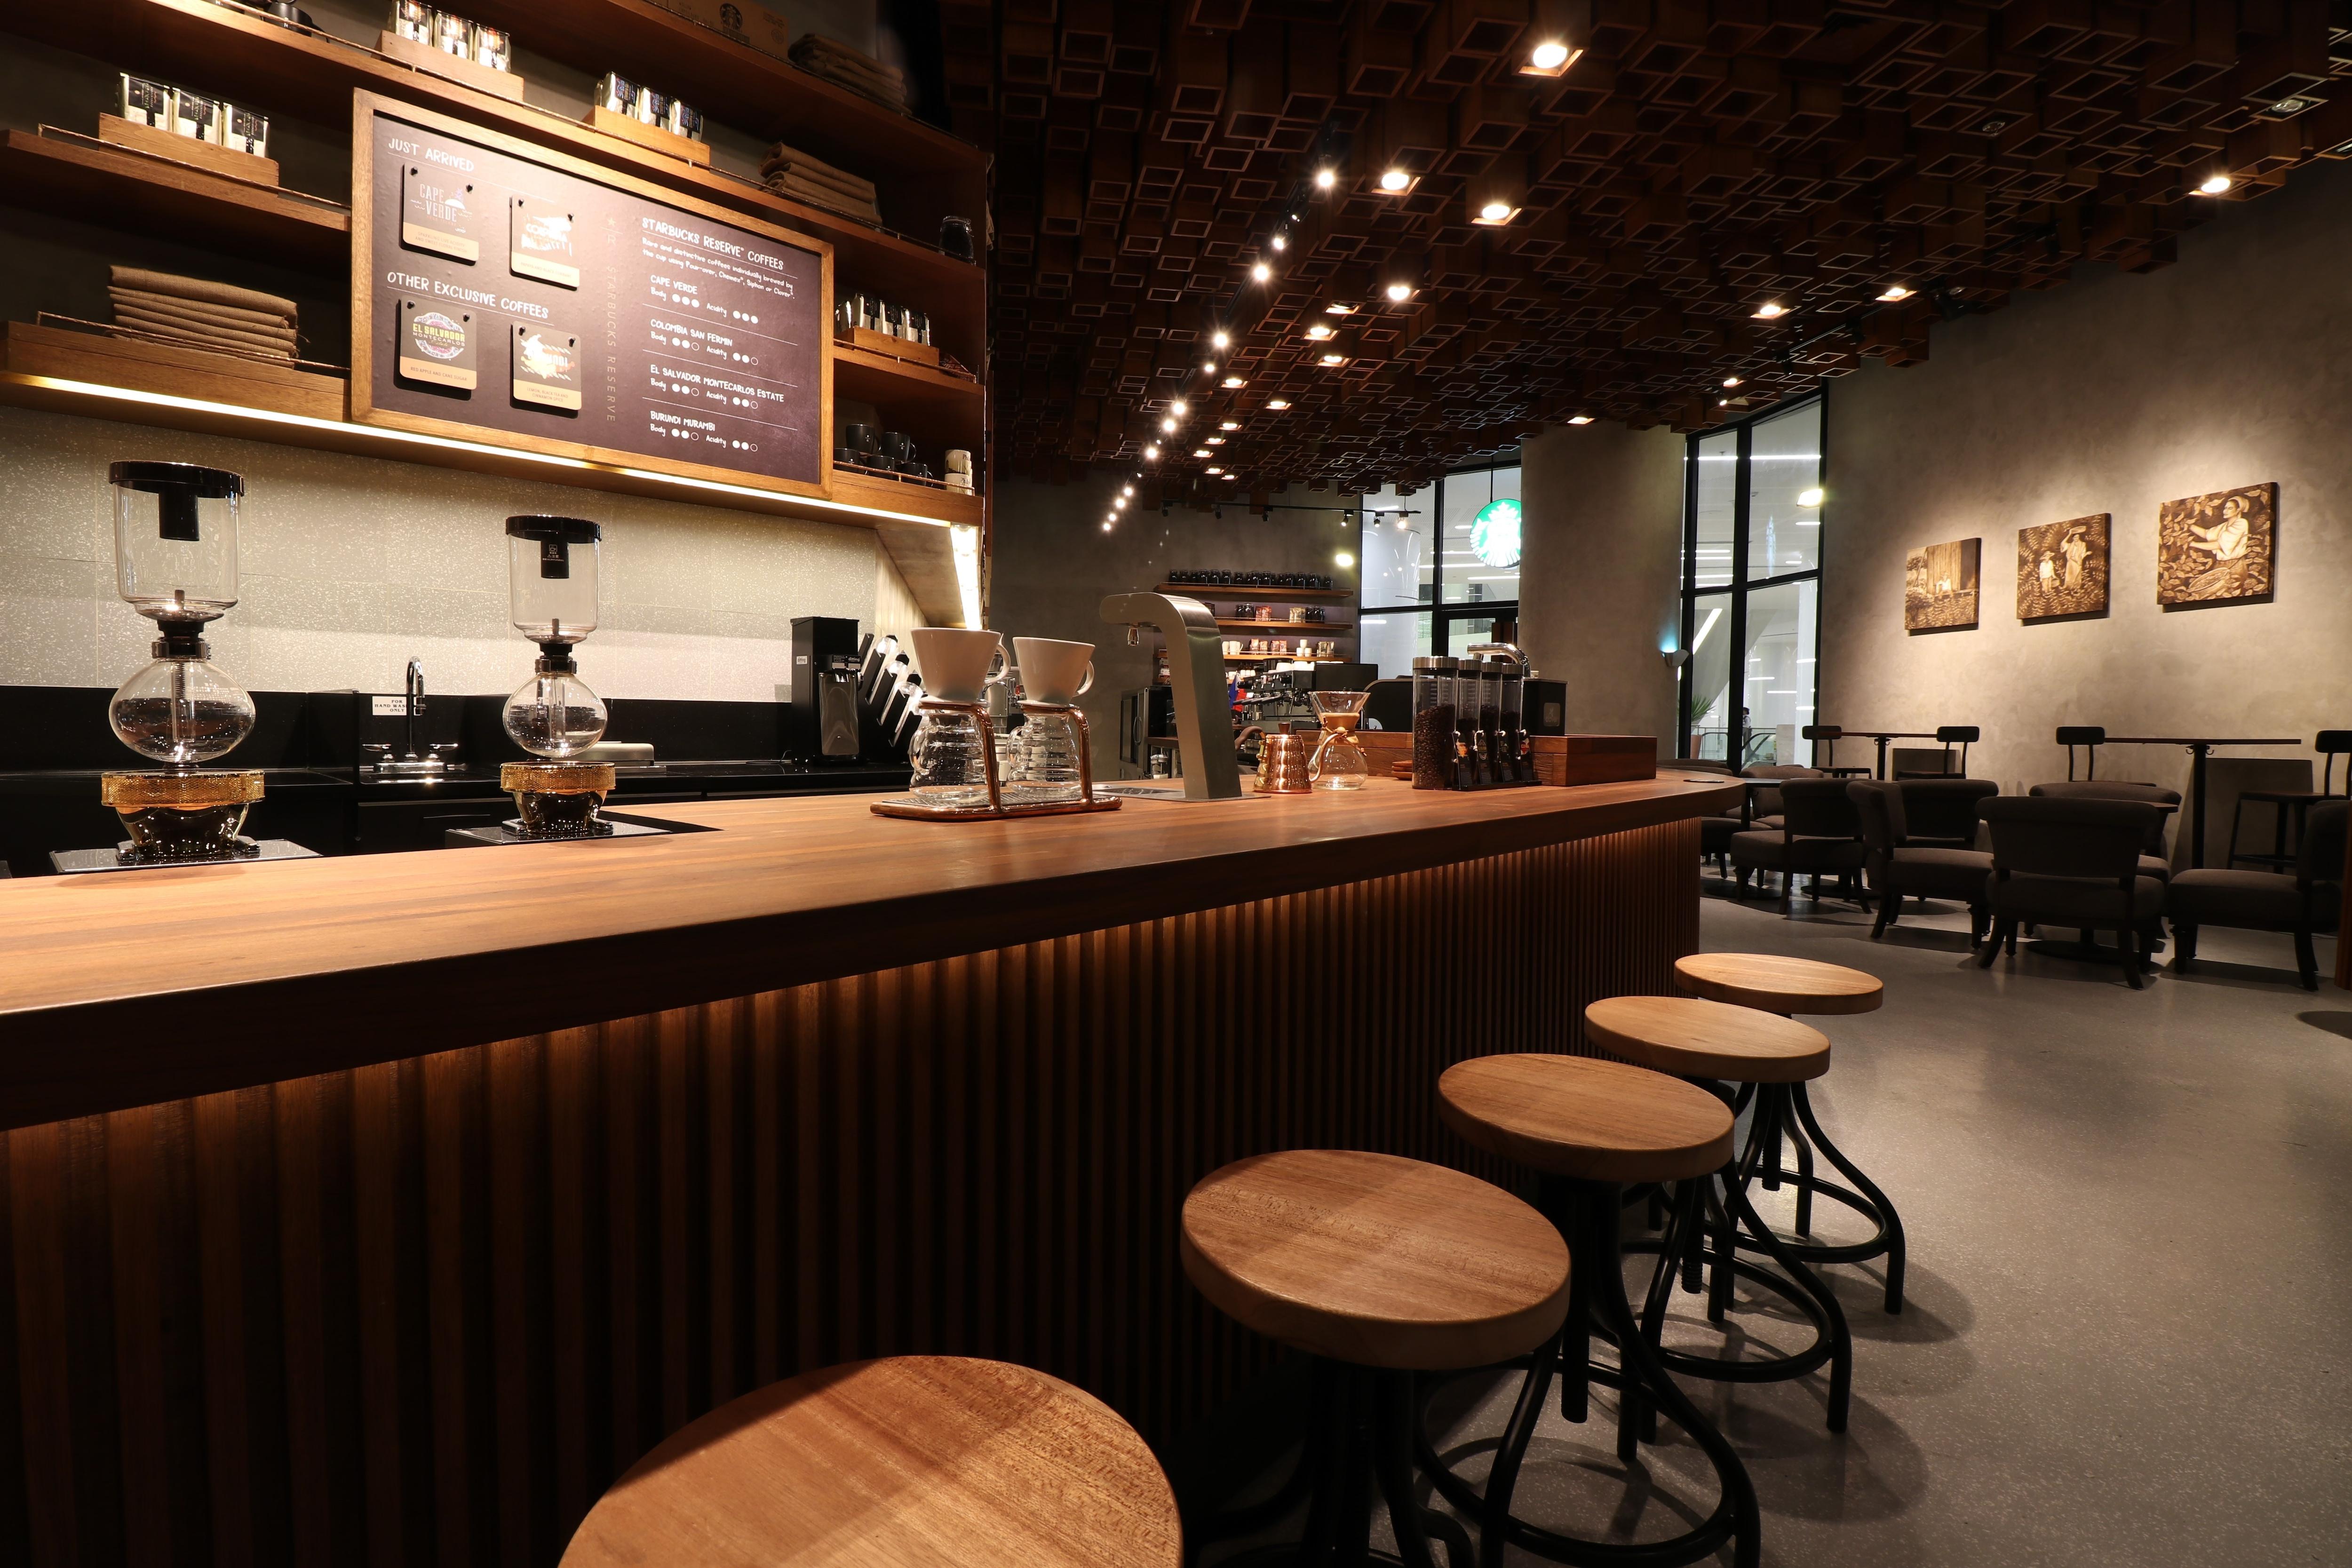 Barista Coffee House Room